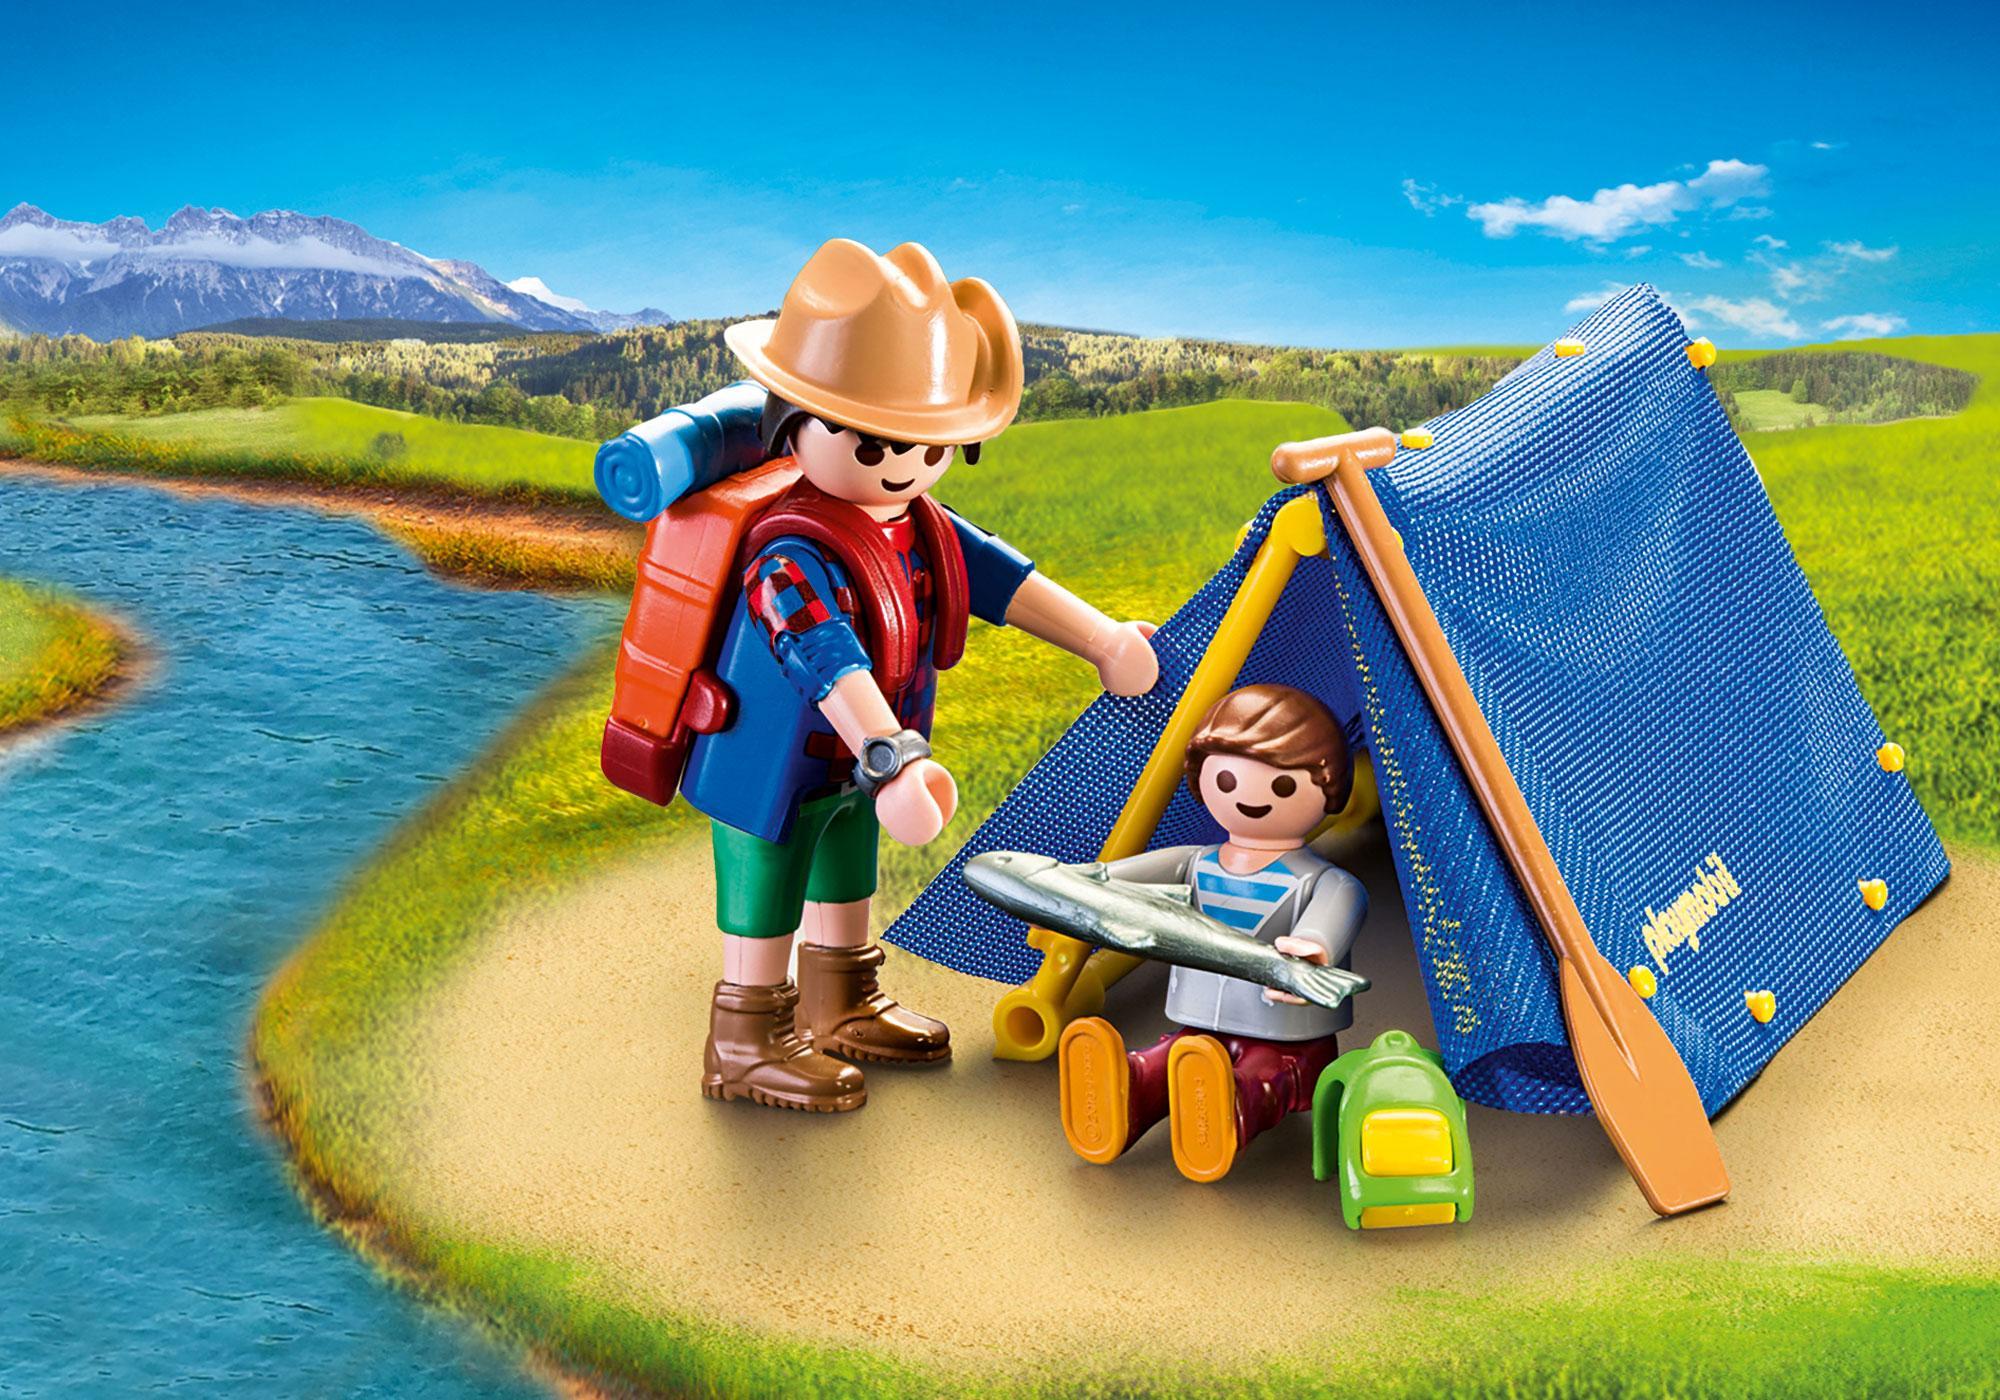 http://media.playmobil.com/i/playmobil/9323_product_extra1/Camping Adventure Carry Case